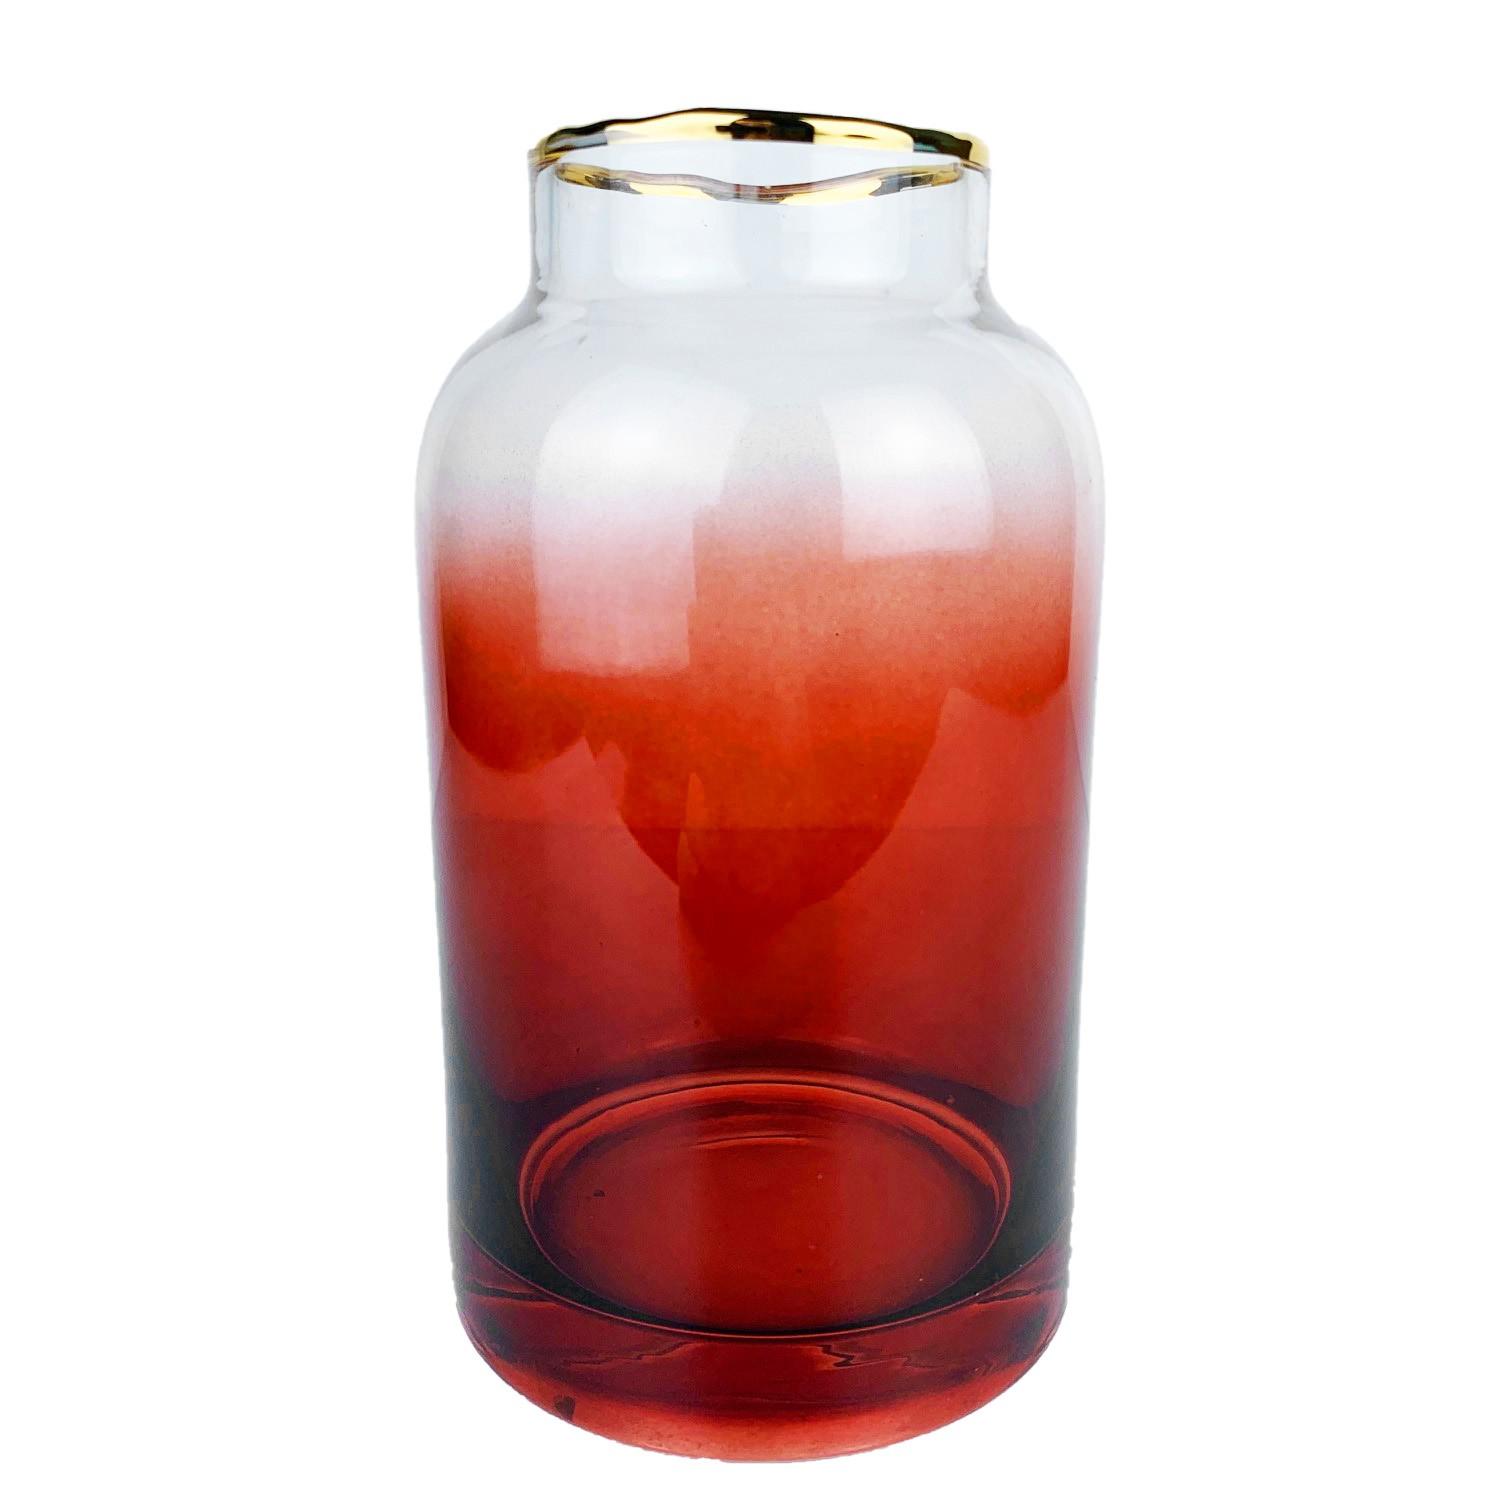 Vaso Rosê com Borda Dourada 14 cm